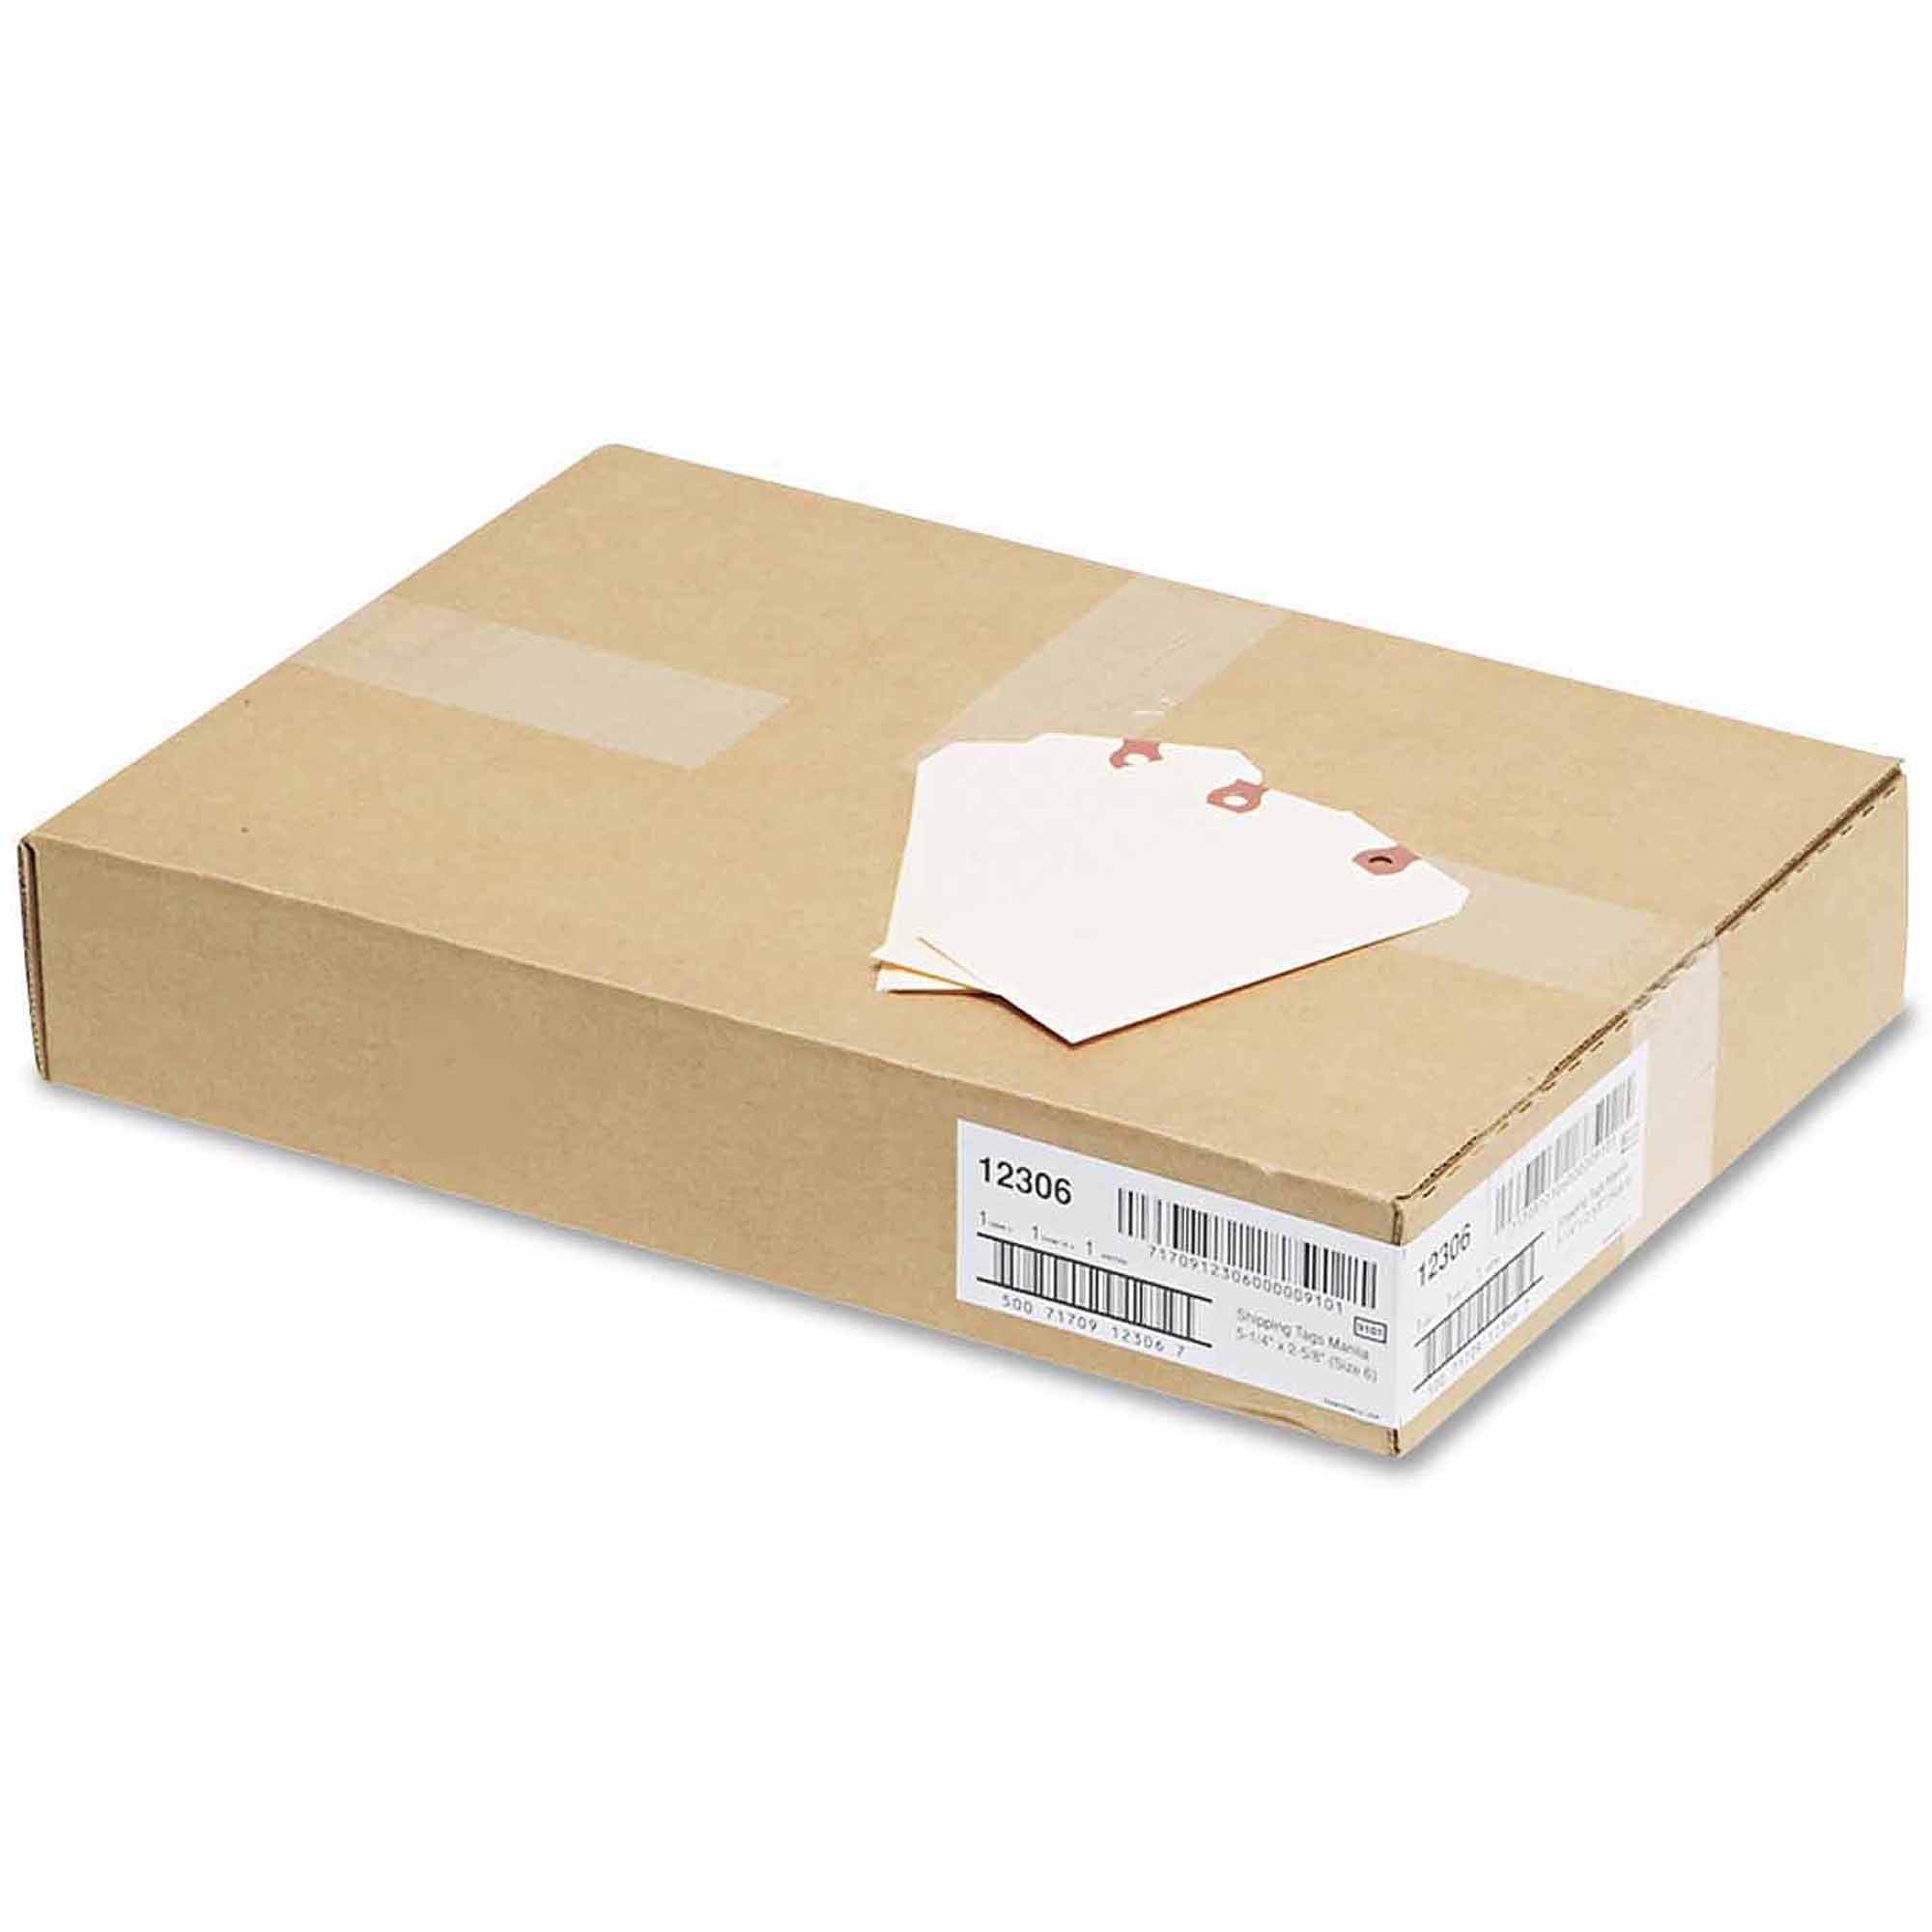 universal laser printer labels template - laser printer permanent labels unv80106